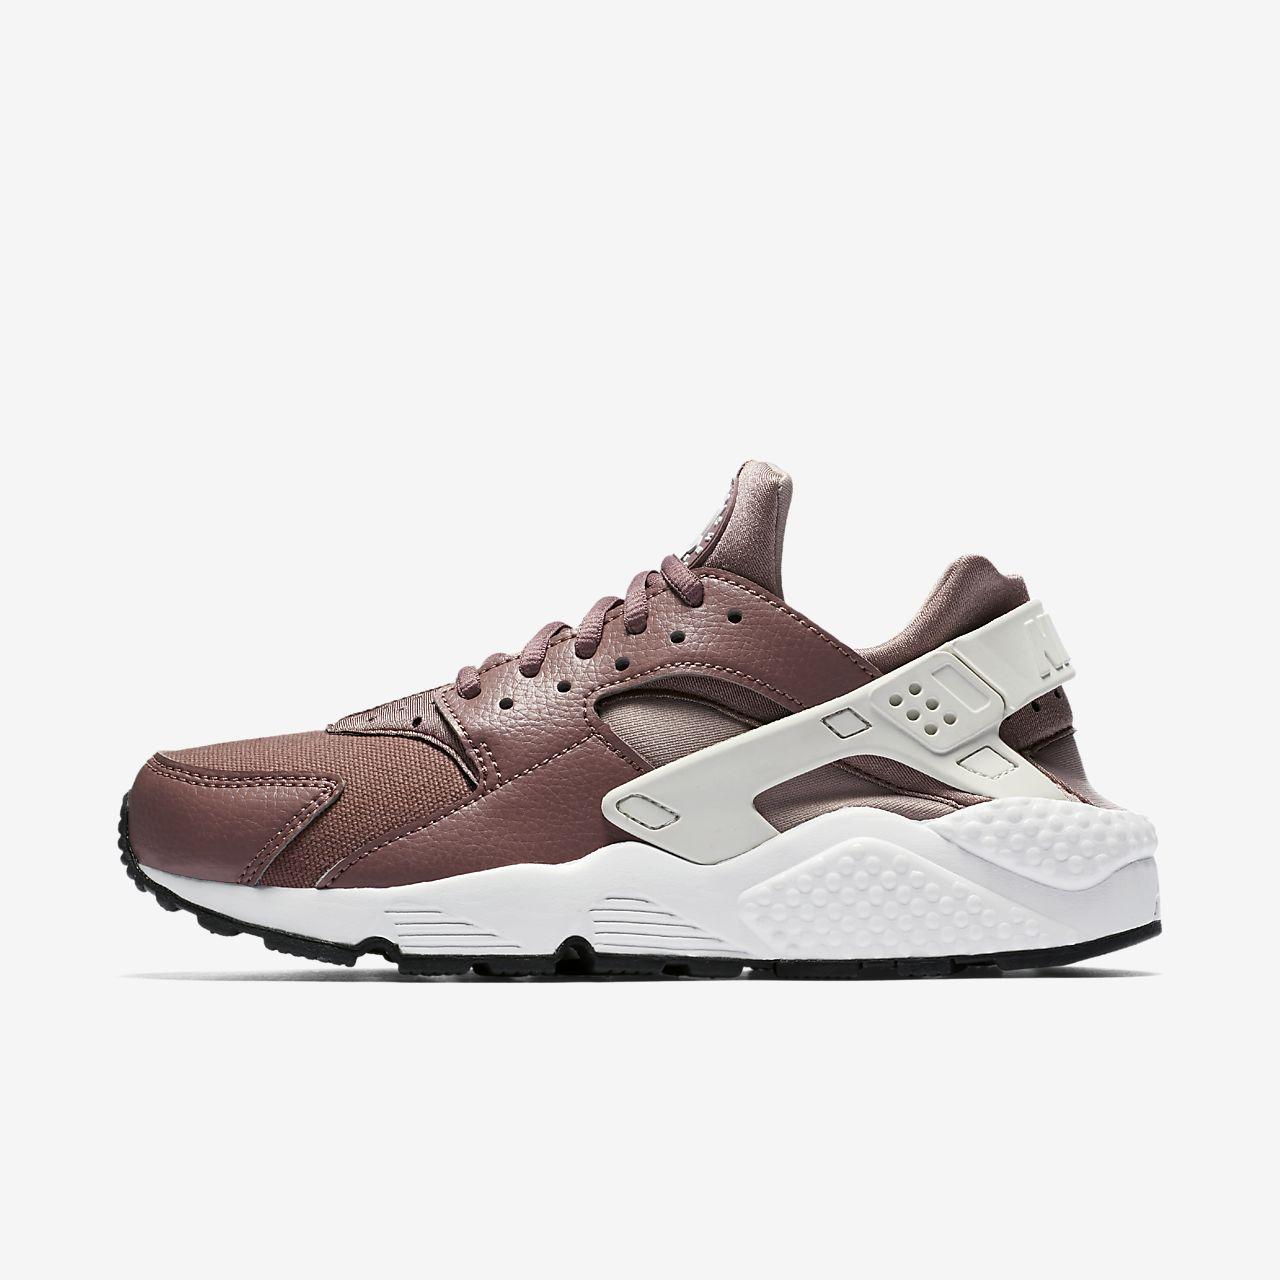 sale retailer 63a7a 71eb3 ... Nike Air Huarache Zapatillas - Mujer